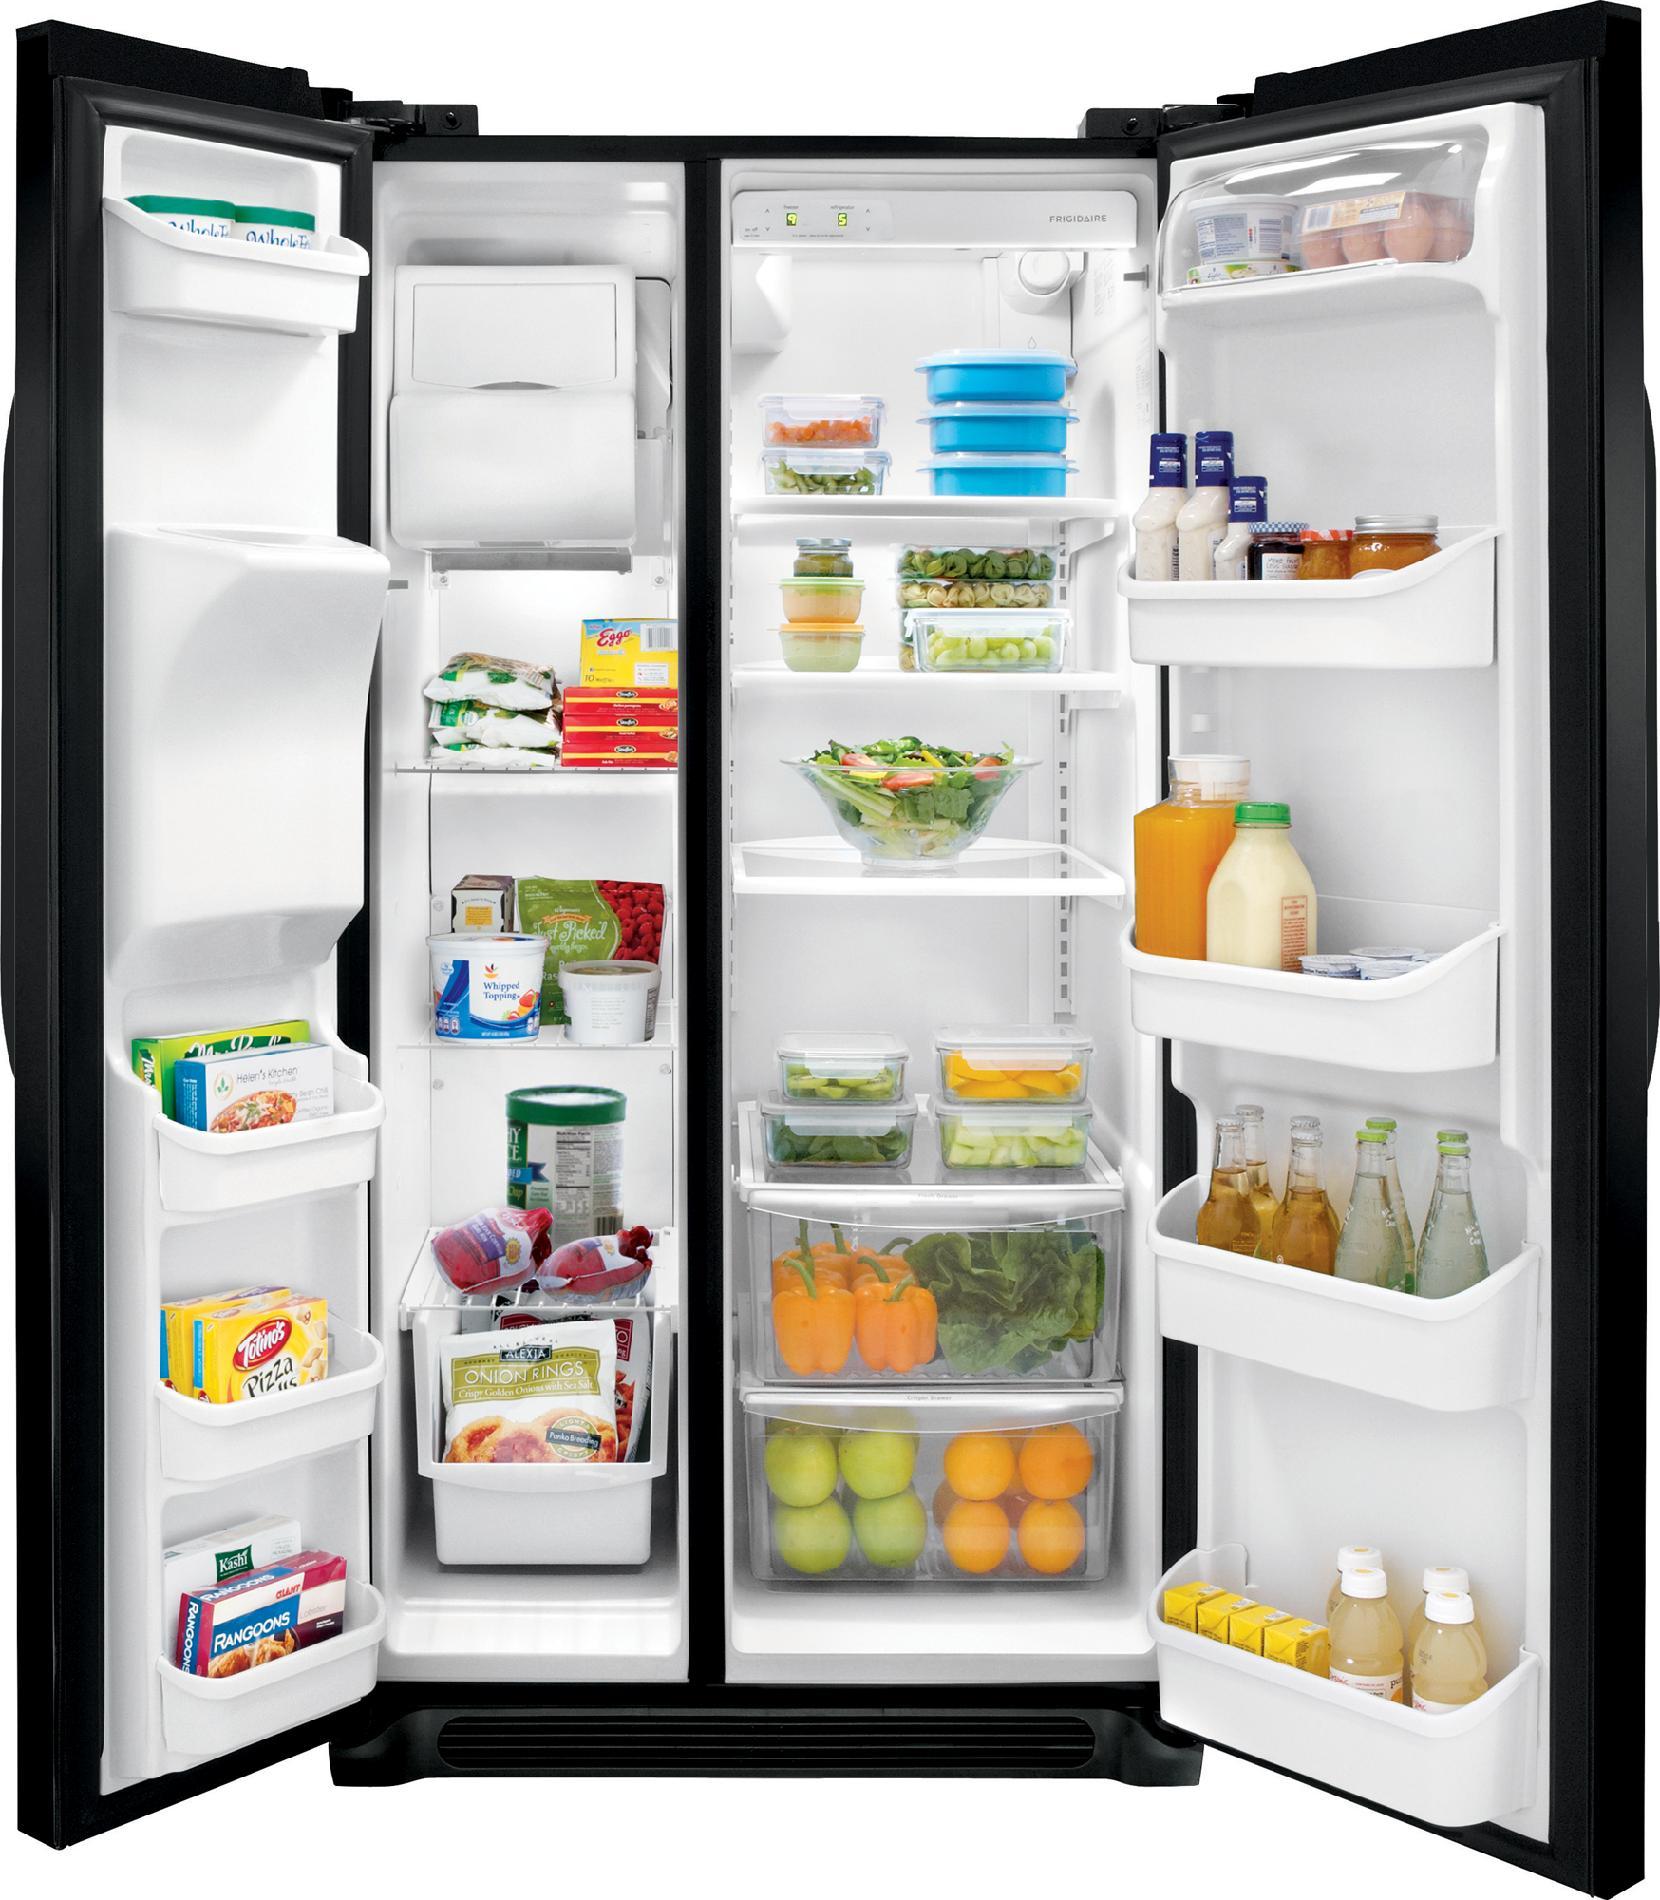 Frigidaire 22.6 cu. ft. Side-by-Side Refrigerator - Black